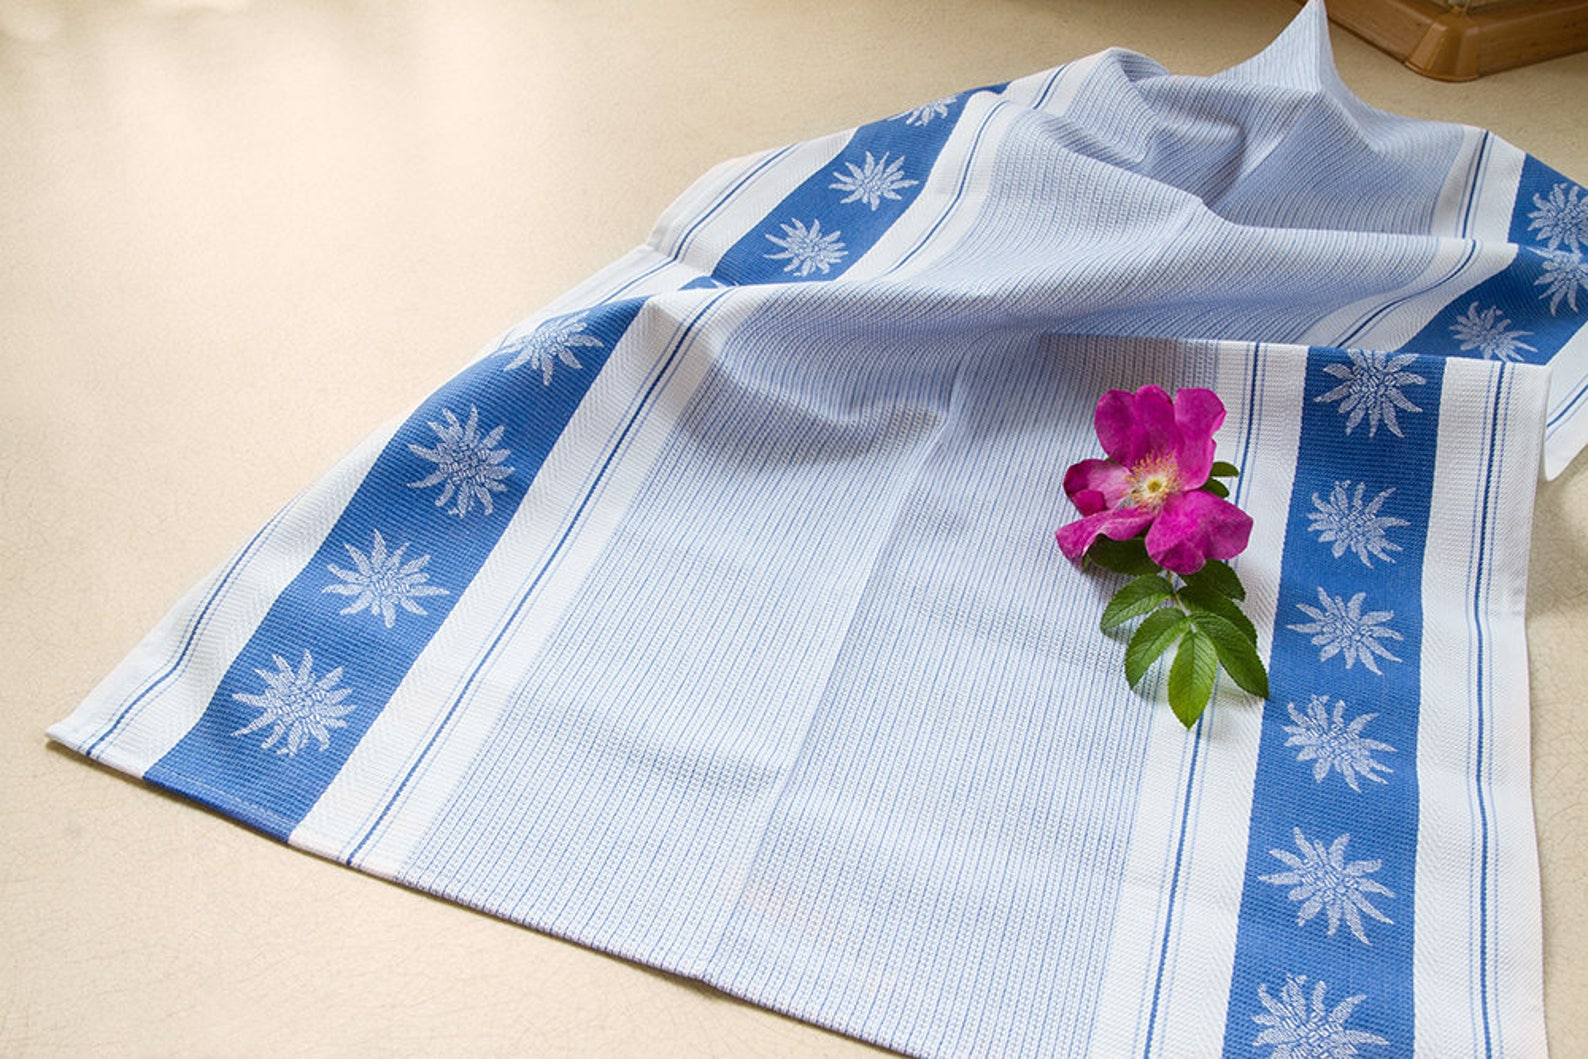 Edelweiss Jacquard Woven Kitchen / Tea Towel